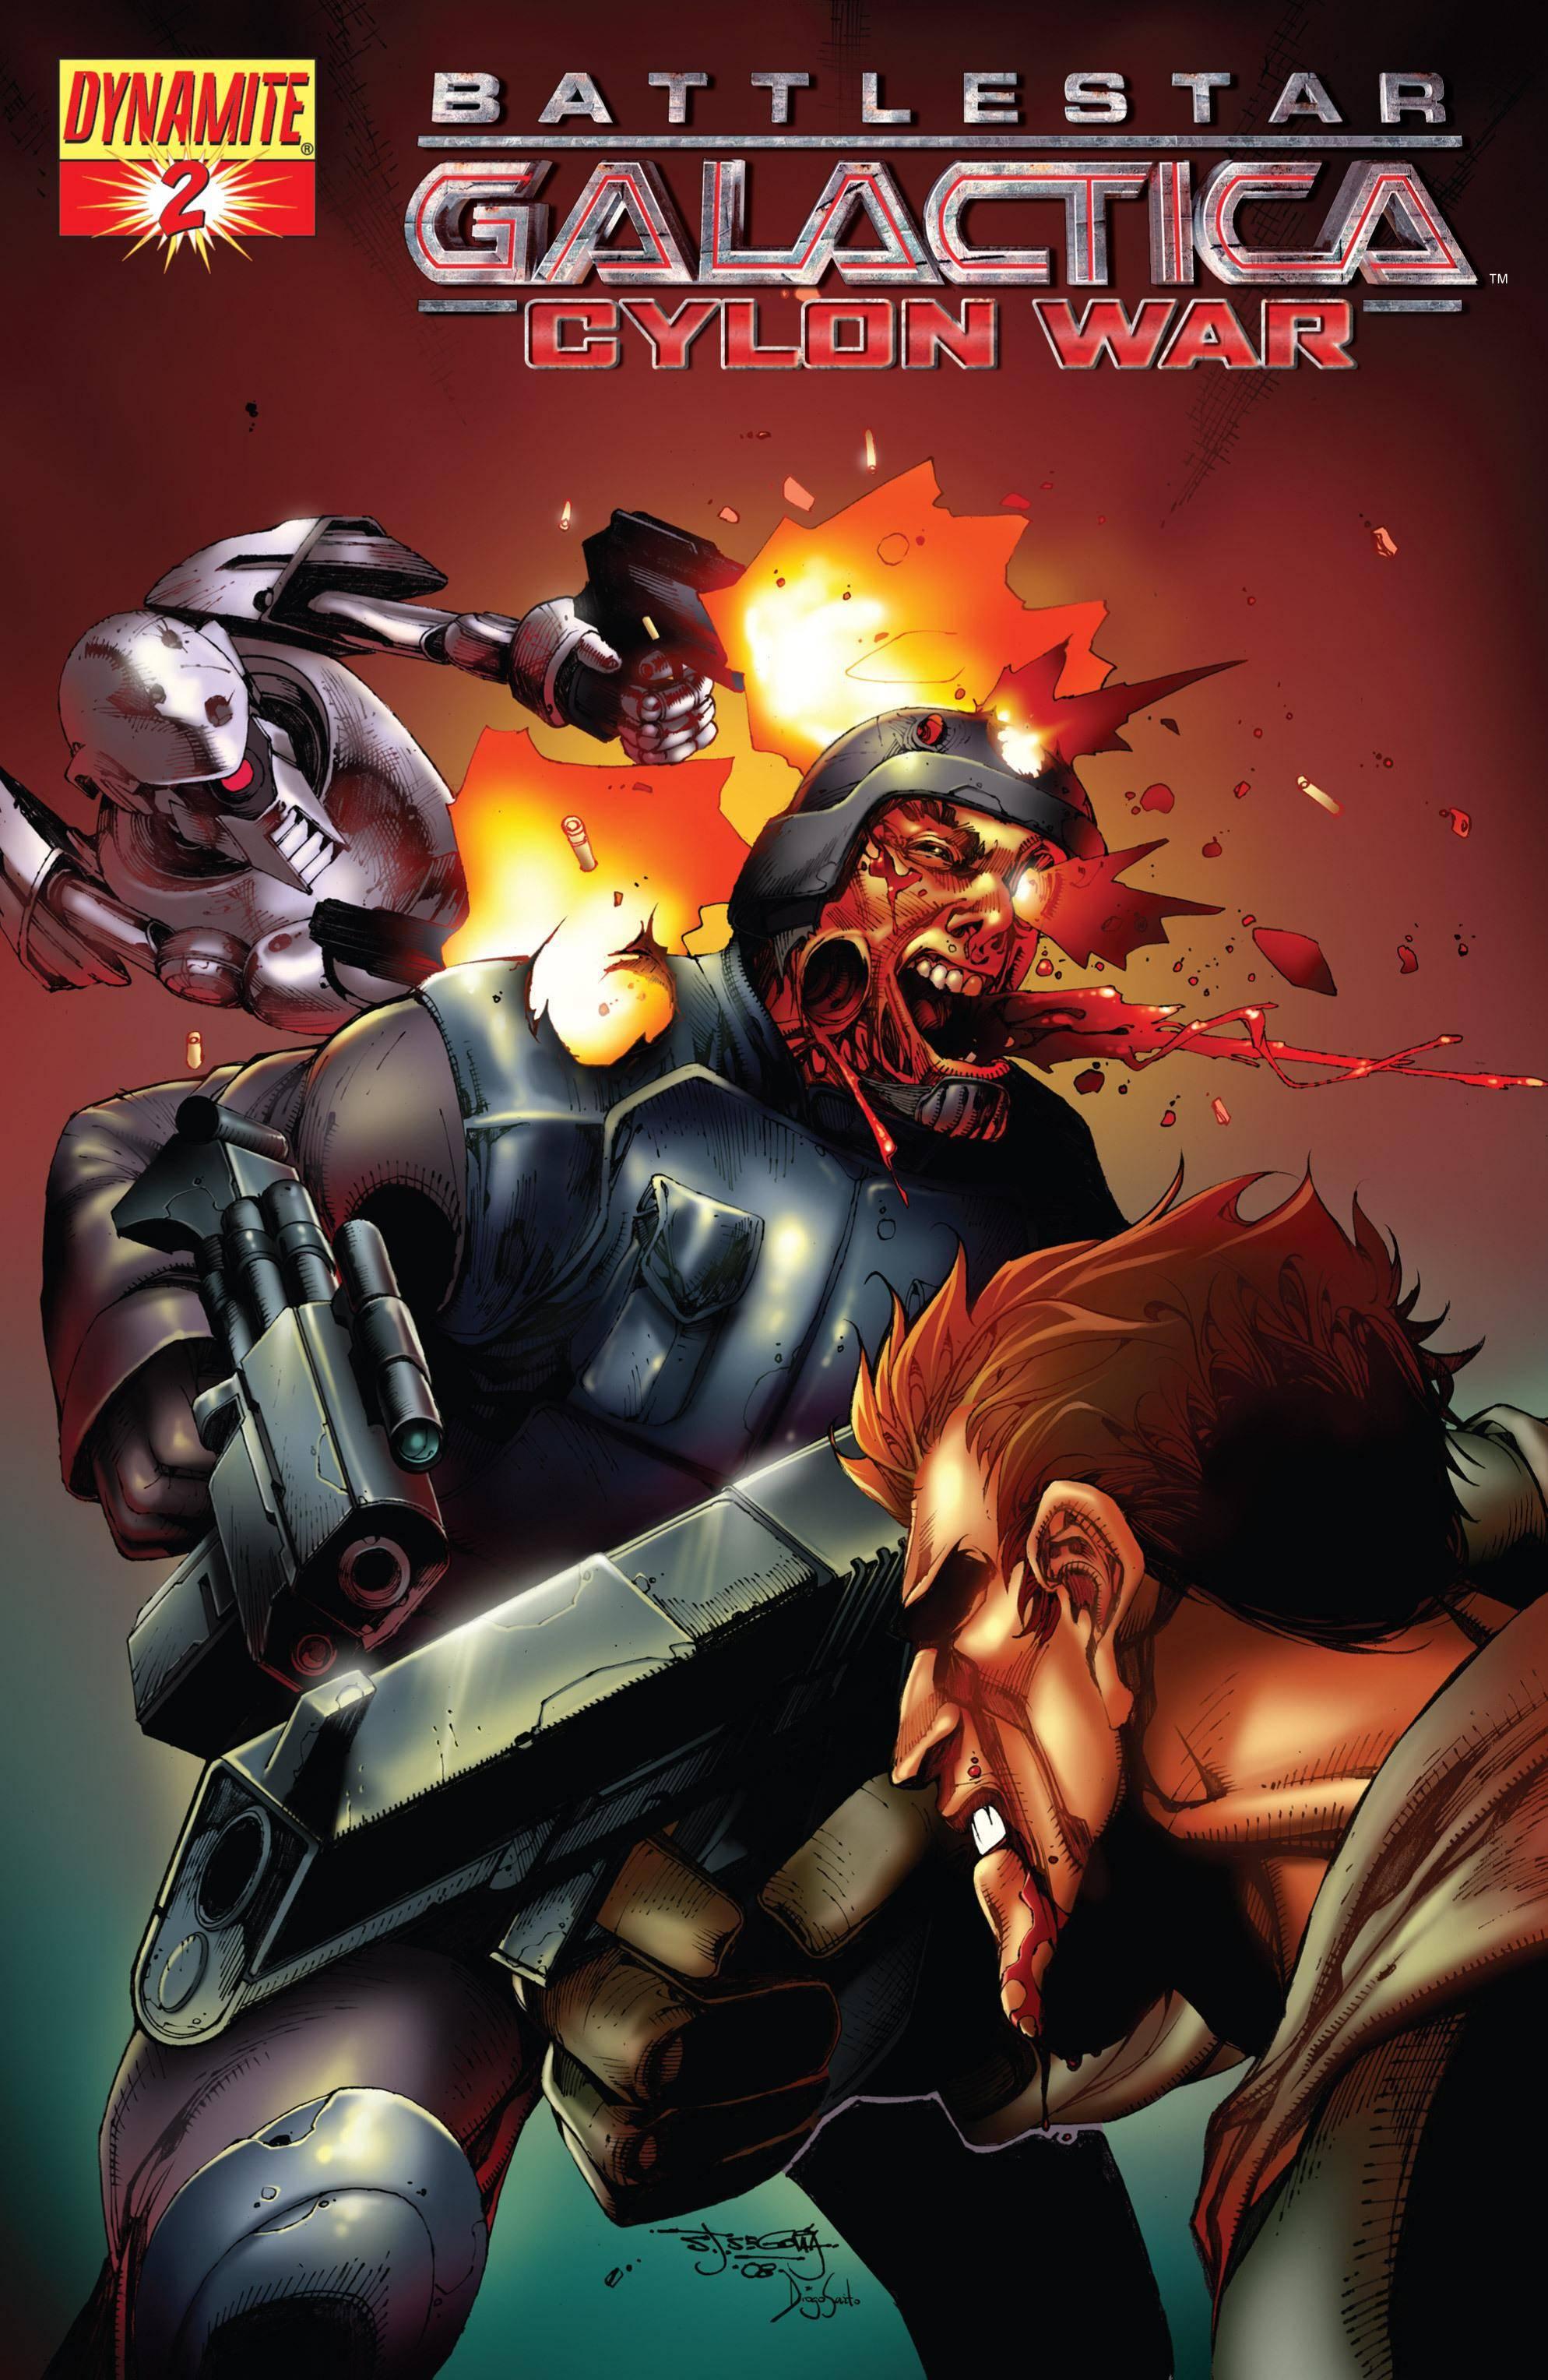 Battlestar Galactica - Cylon War 002 2009 2 covers digital